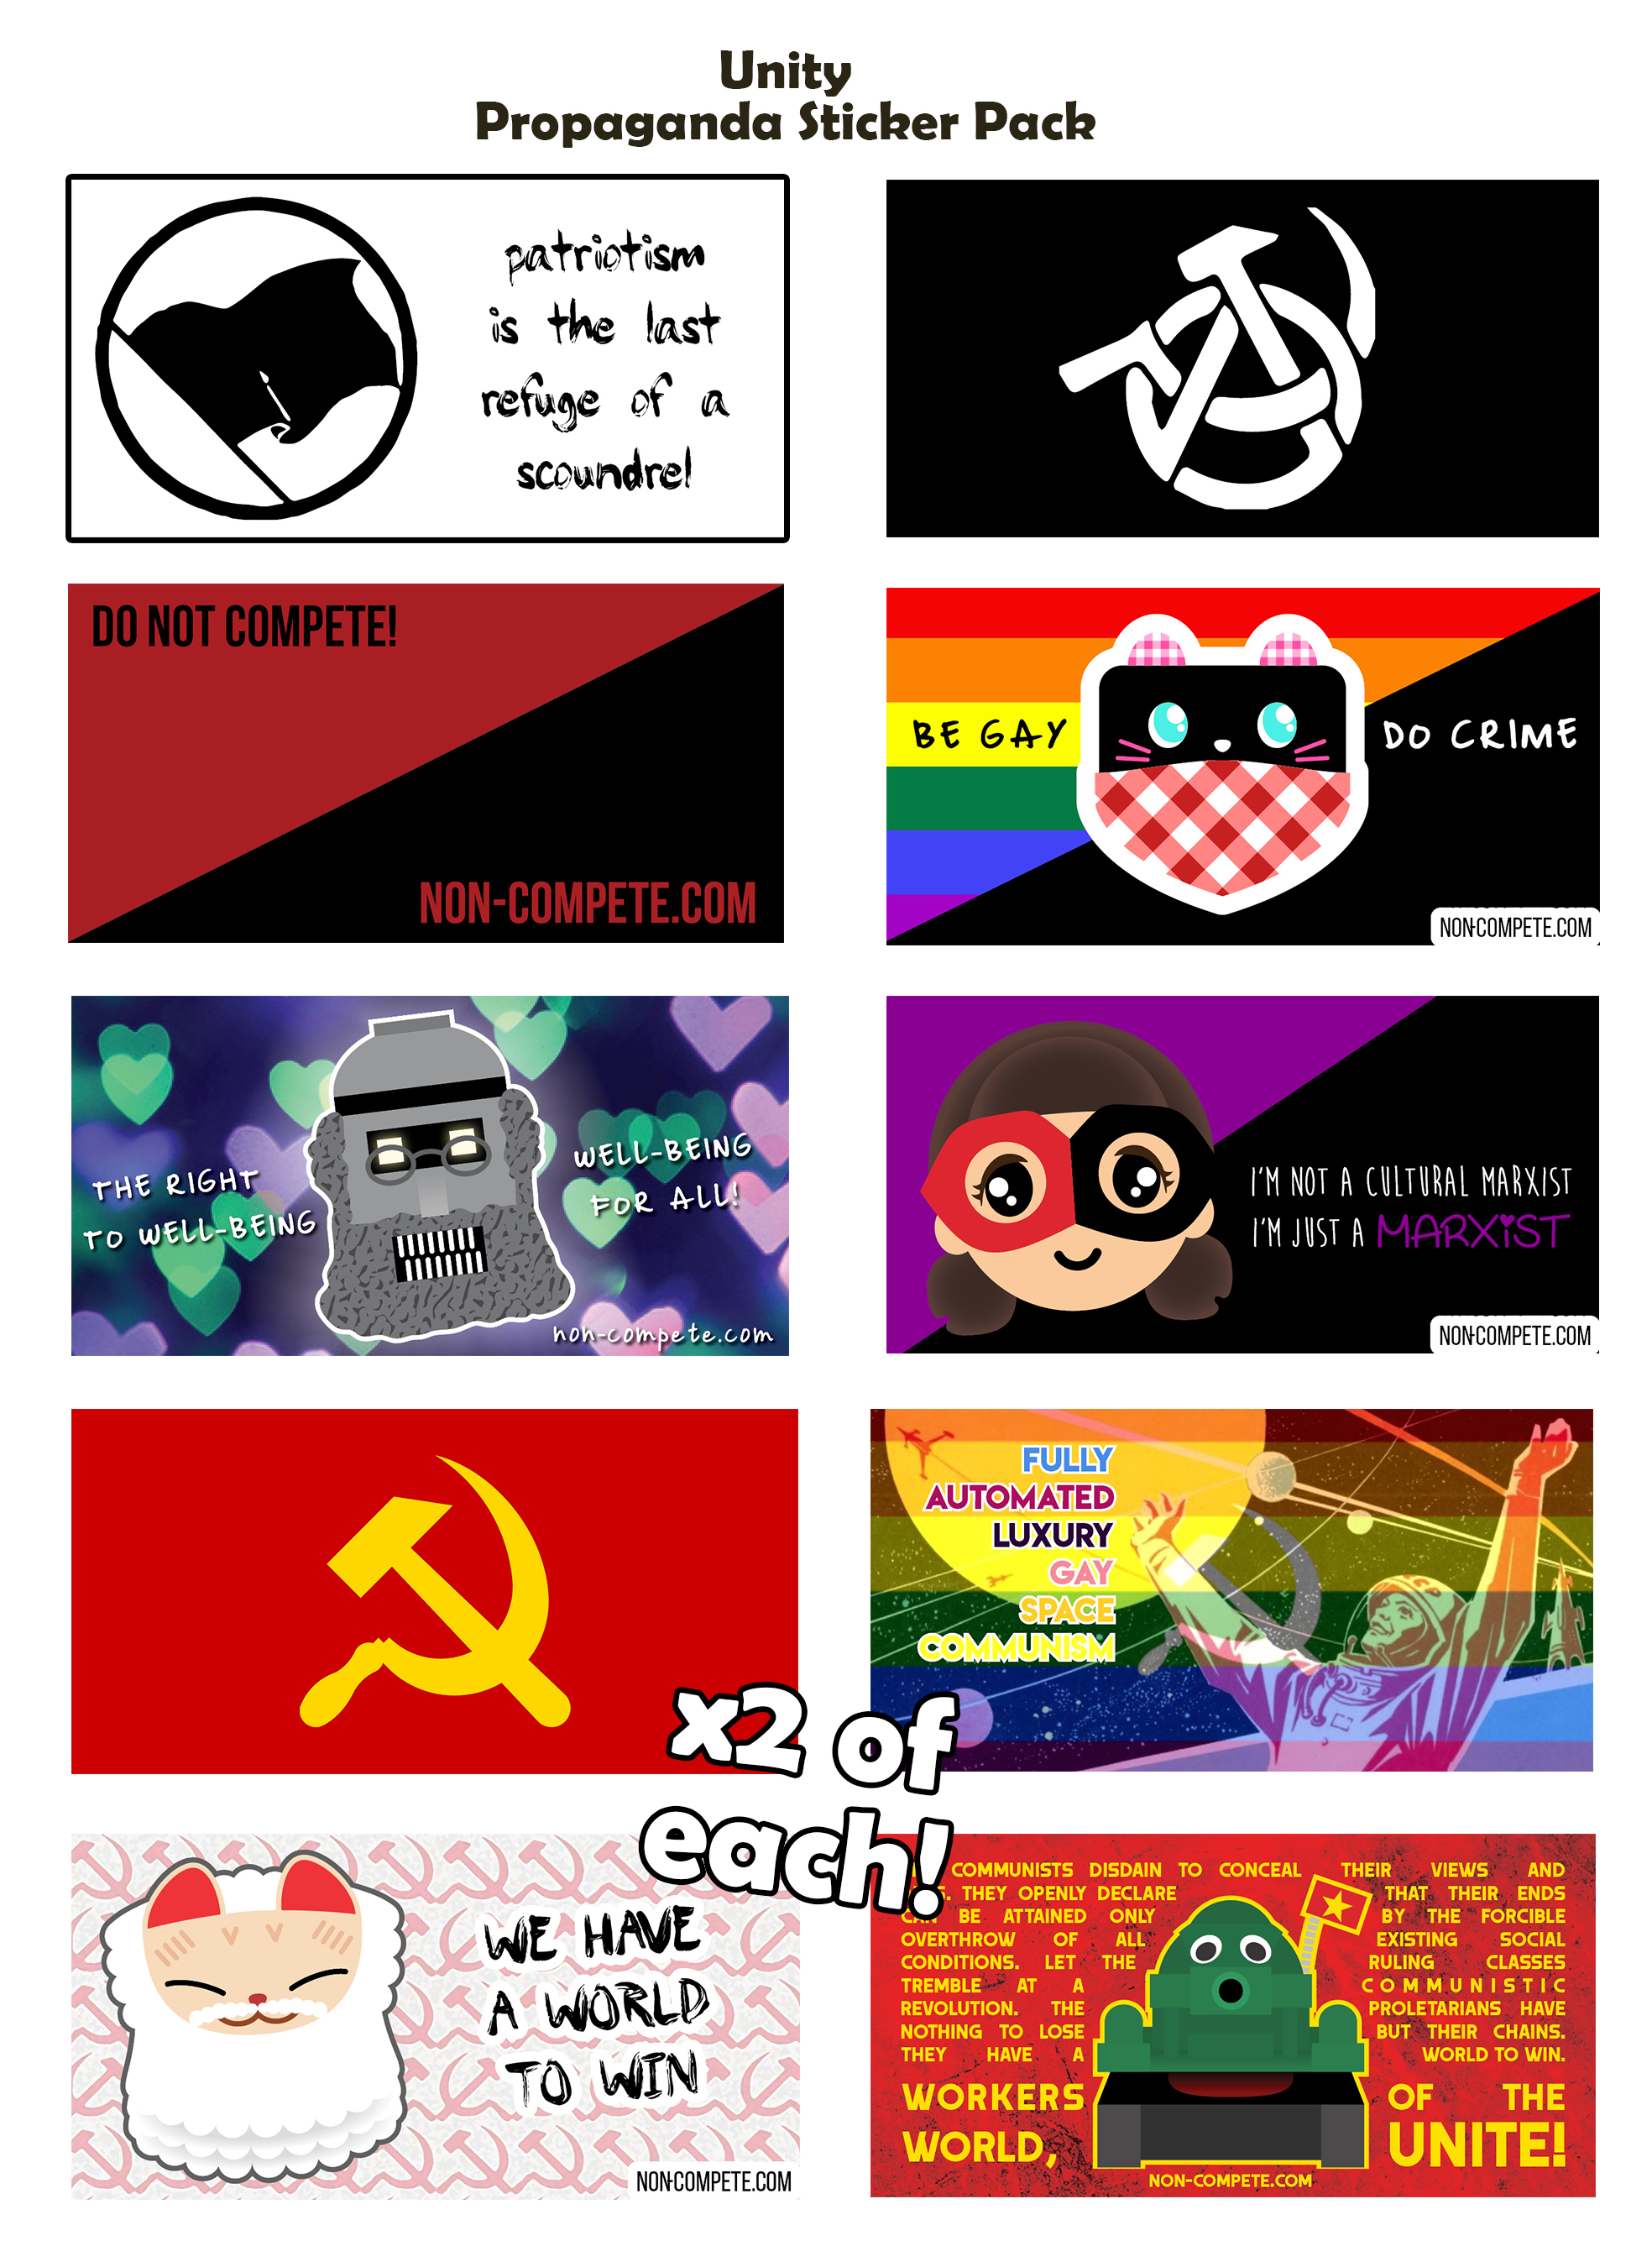 Propaganda Sticker Packs (x20) (Choose from ML/Anarchist/Unity)